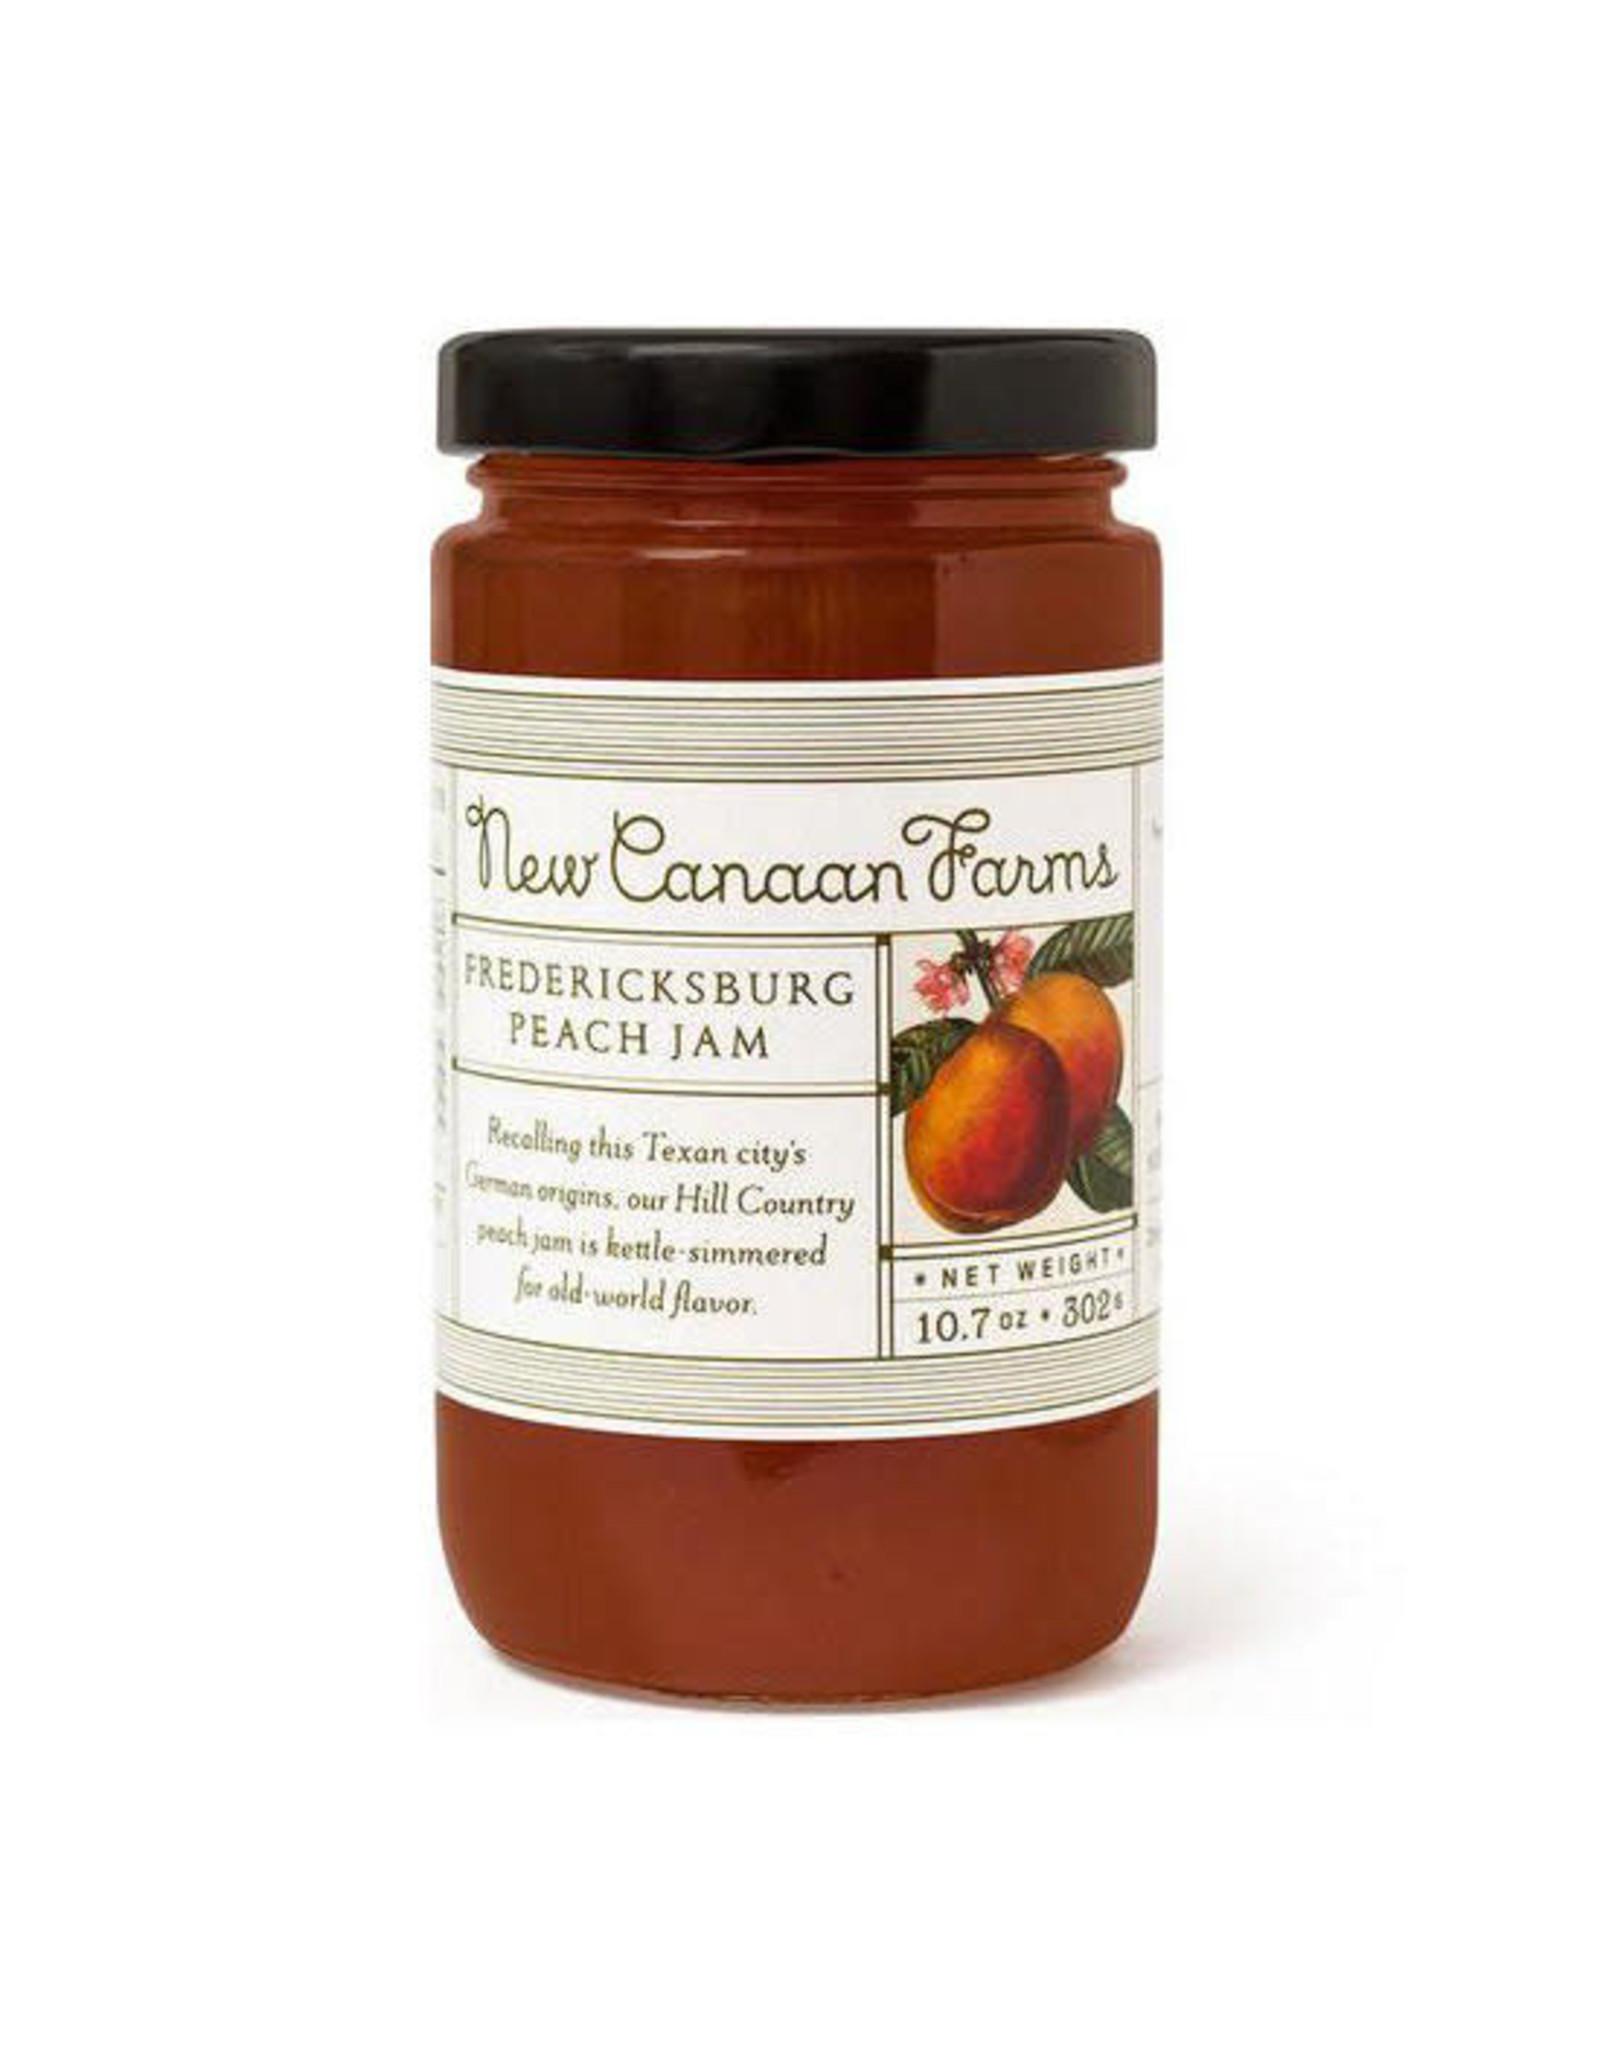 Fredericksburg Peach Jam